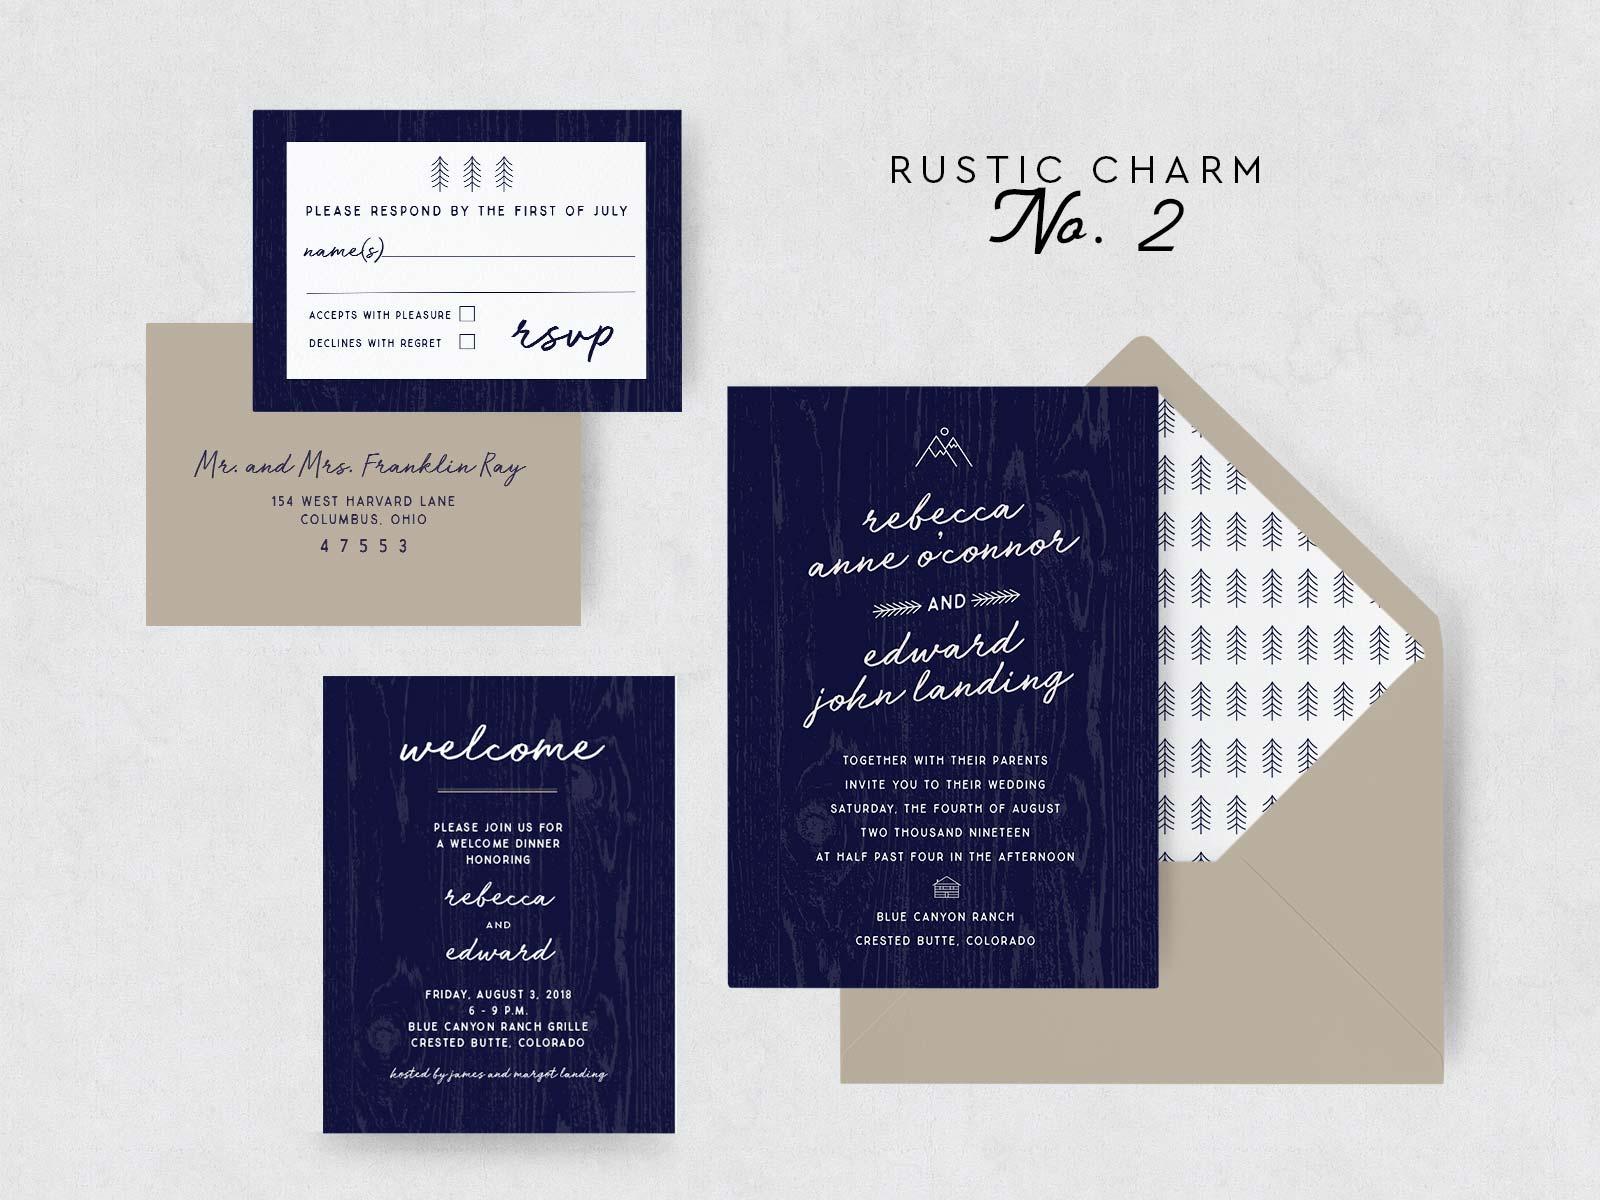 Rustic-Charm-2.jpg